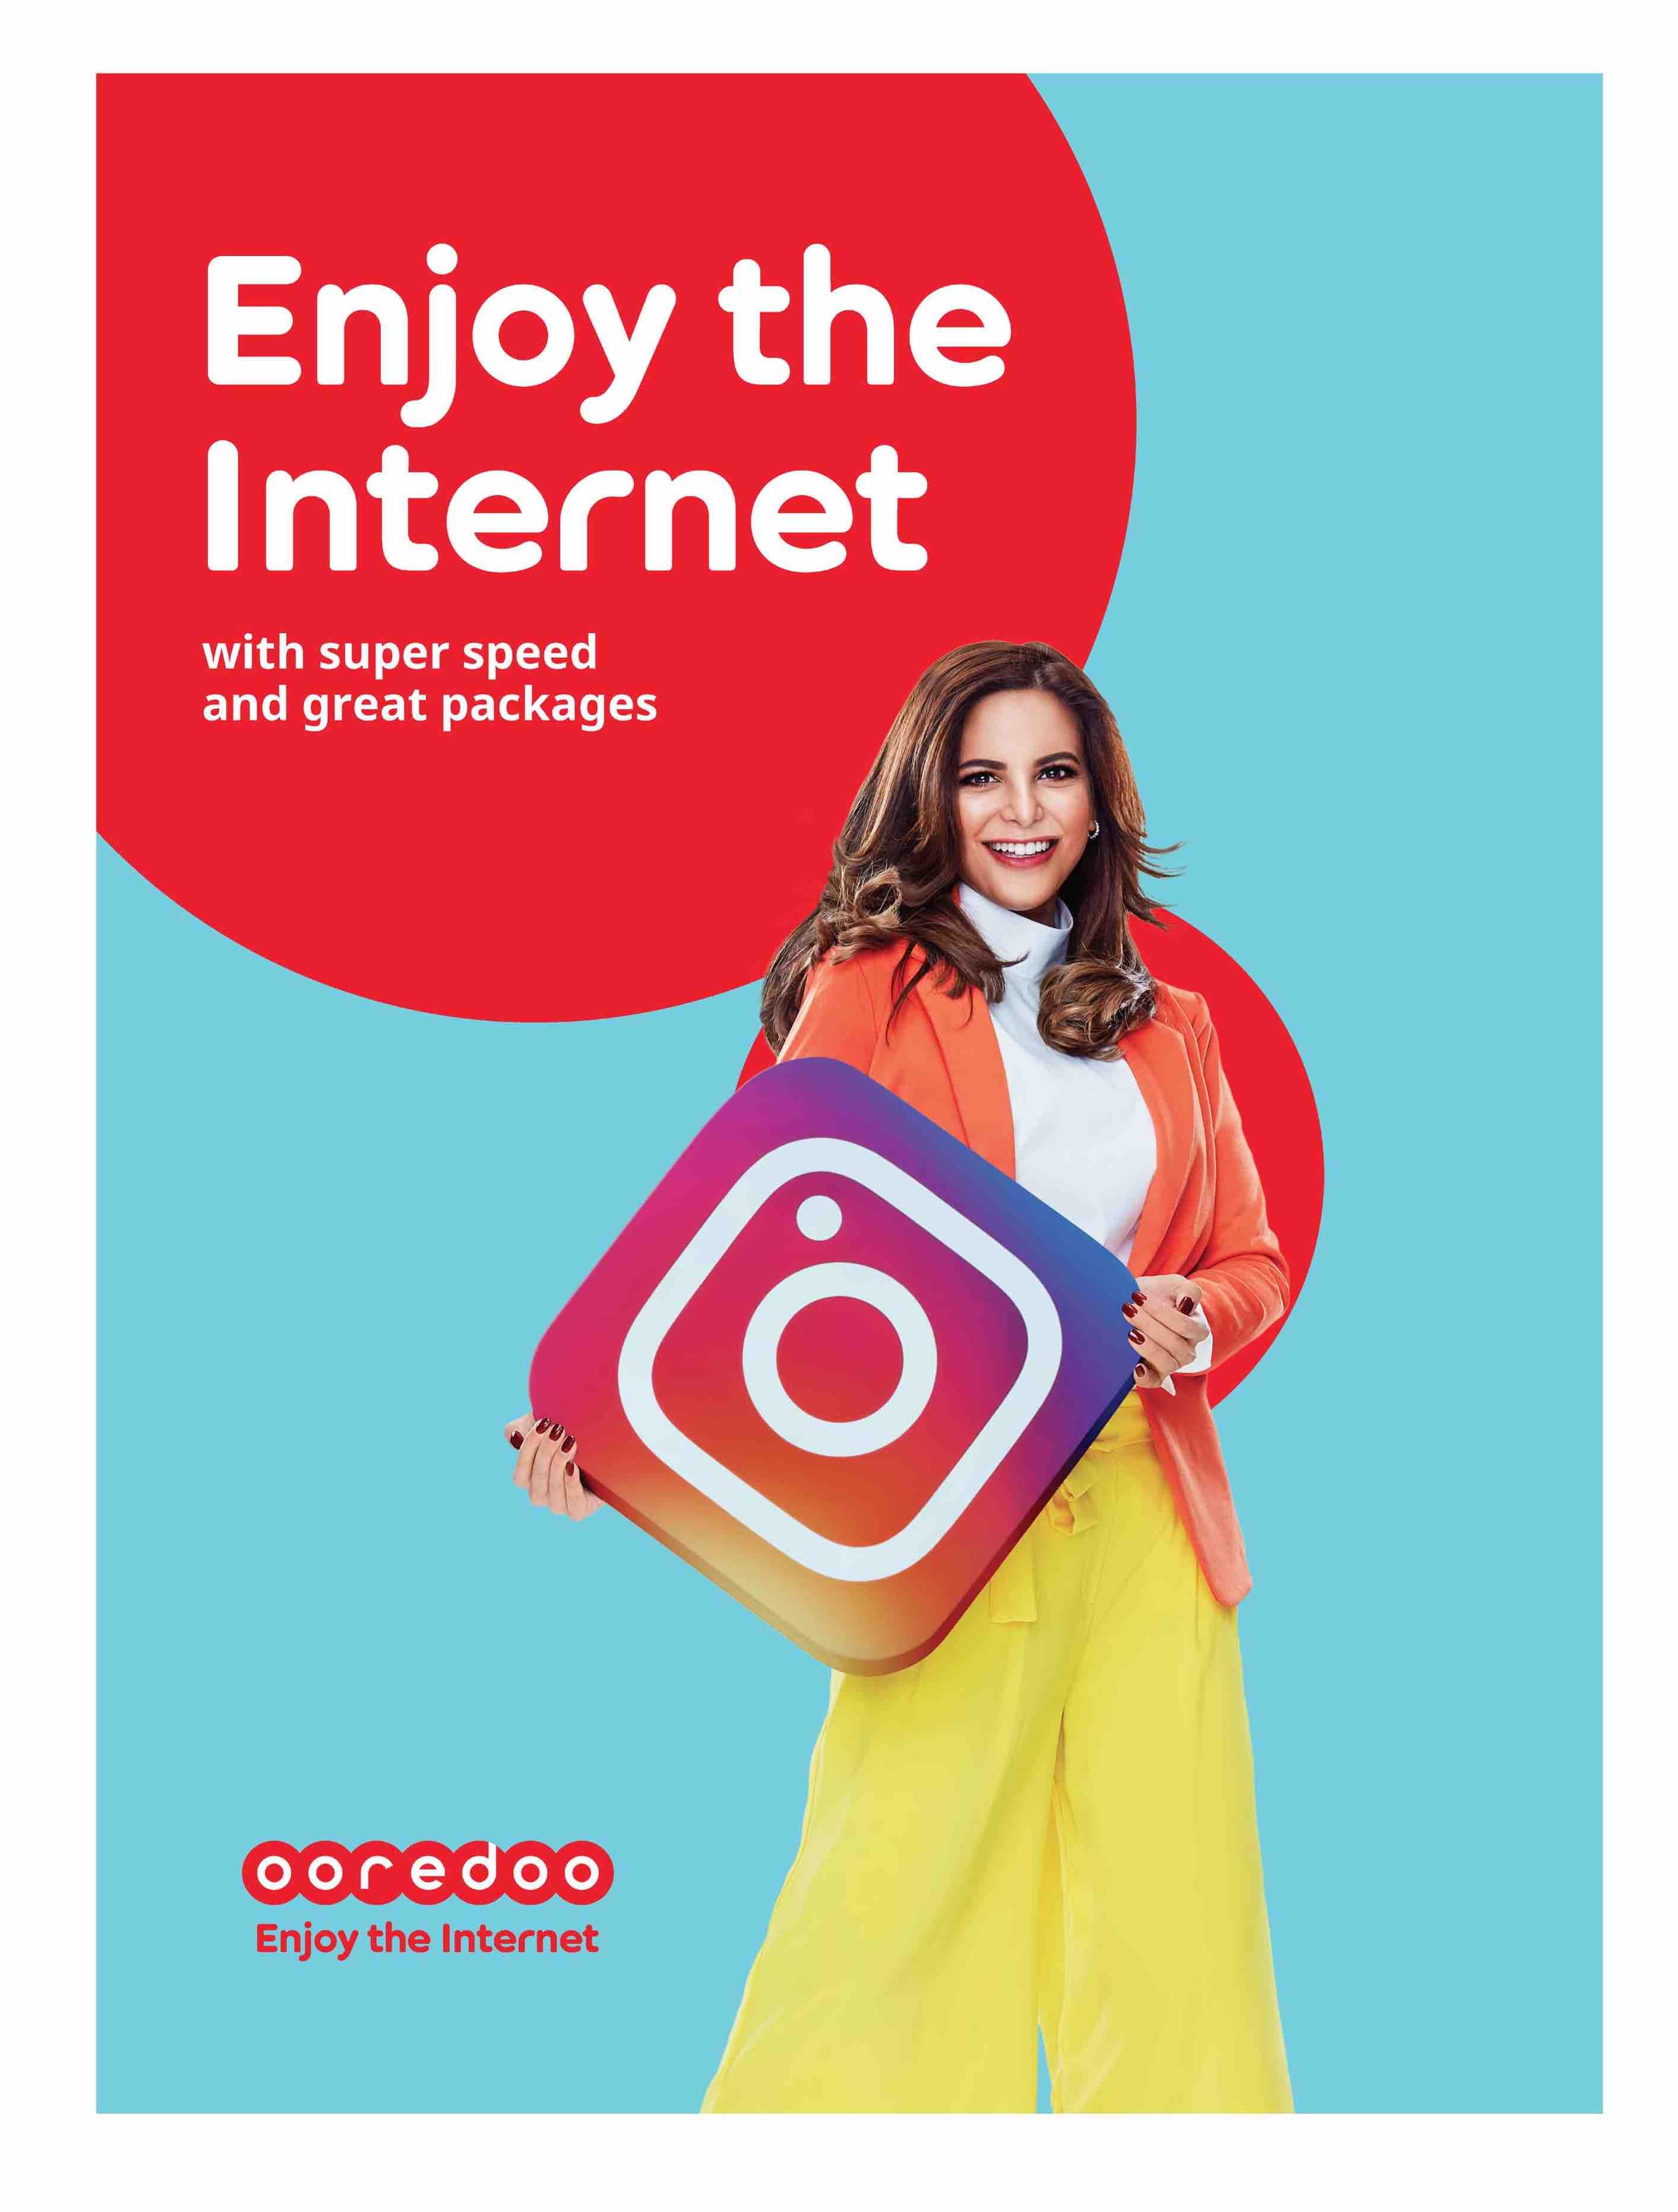 Ooredoo-Enjoy-The-Internet-Instagram